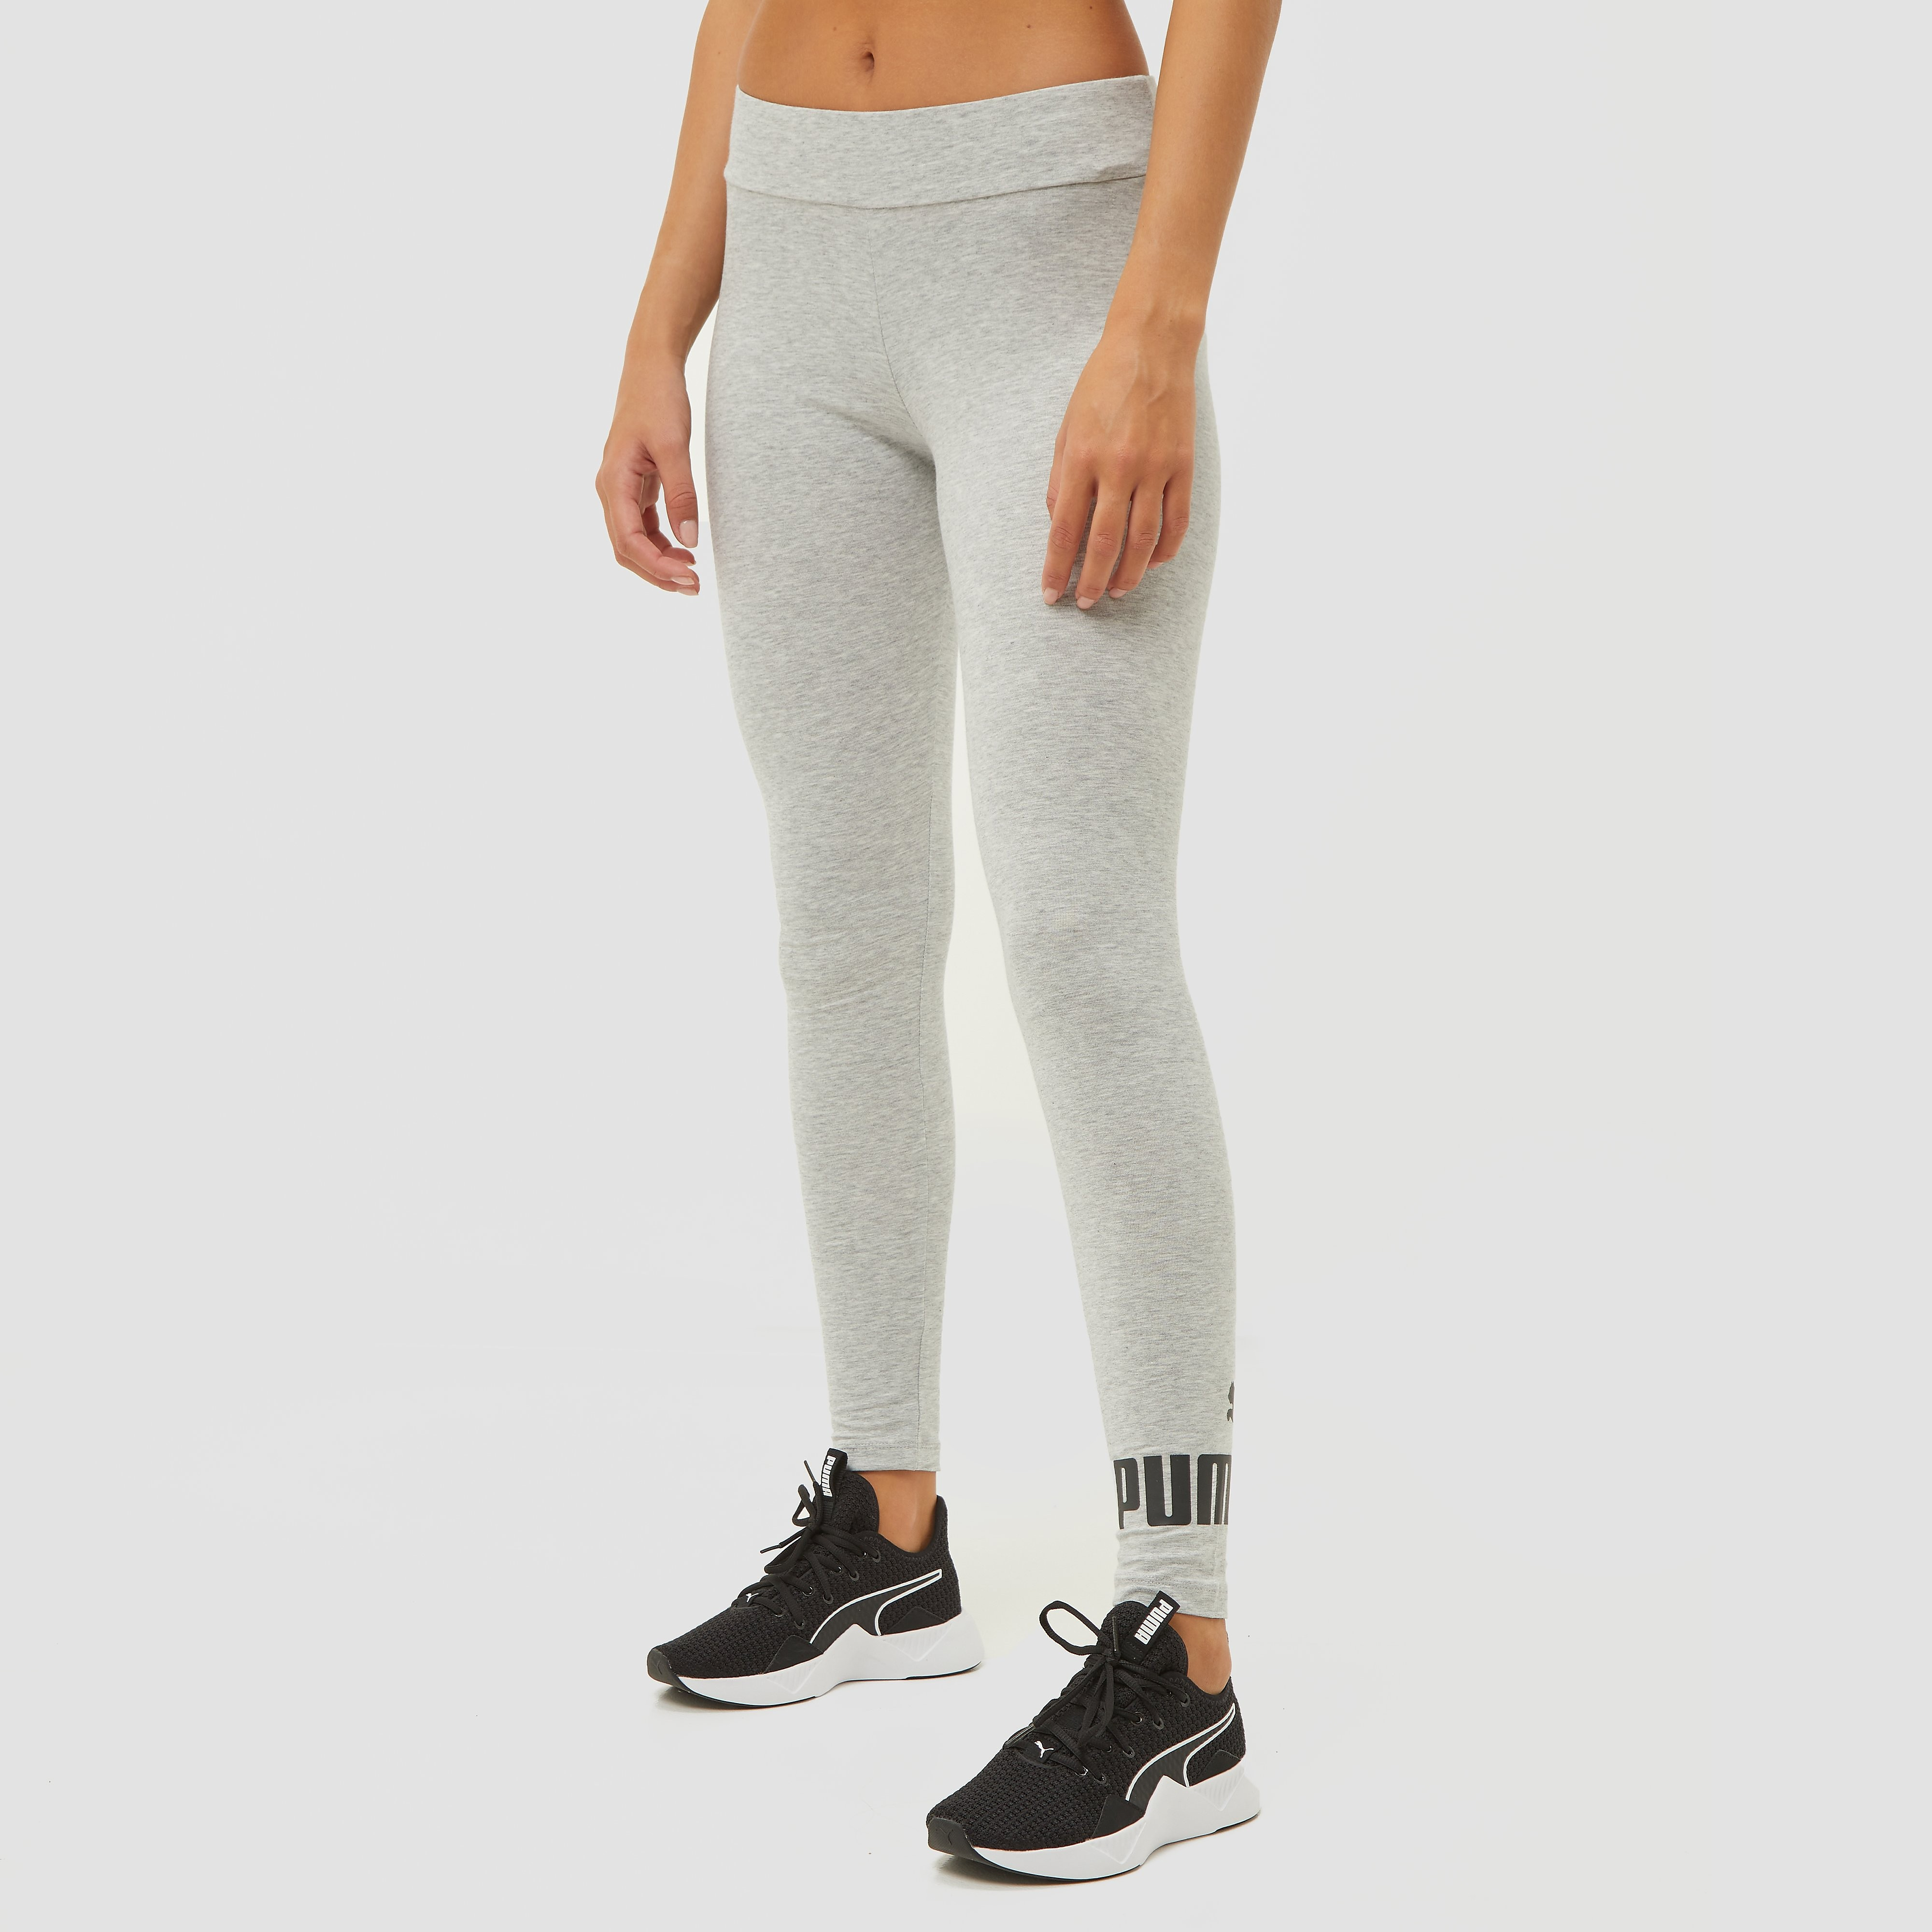 Puma Puma essentials logo legging grijs dames dames